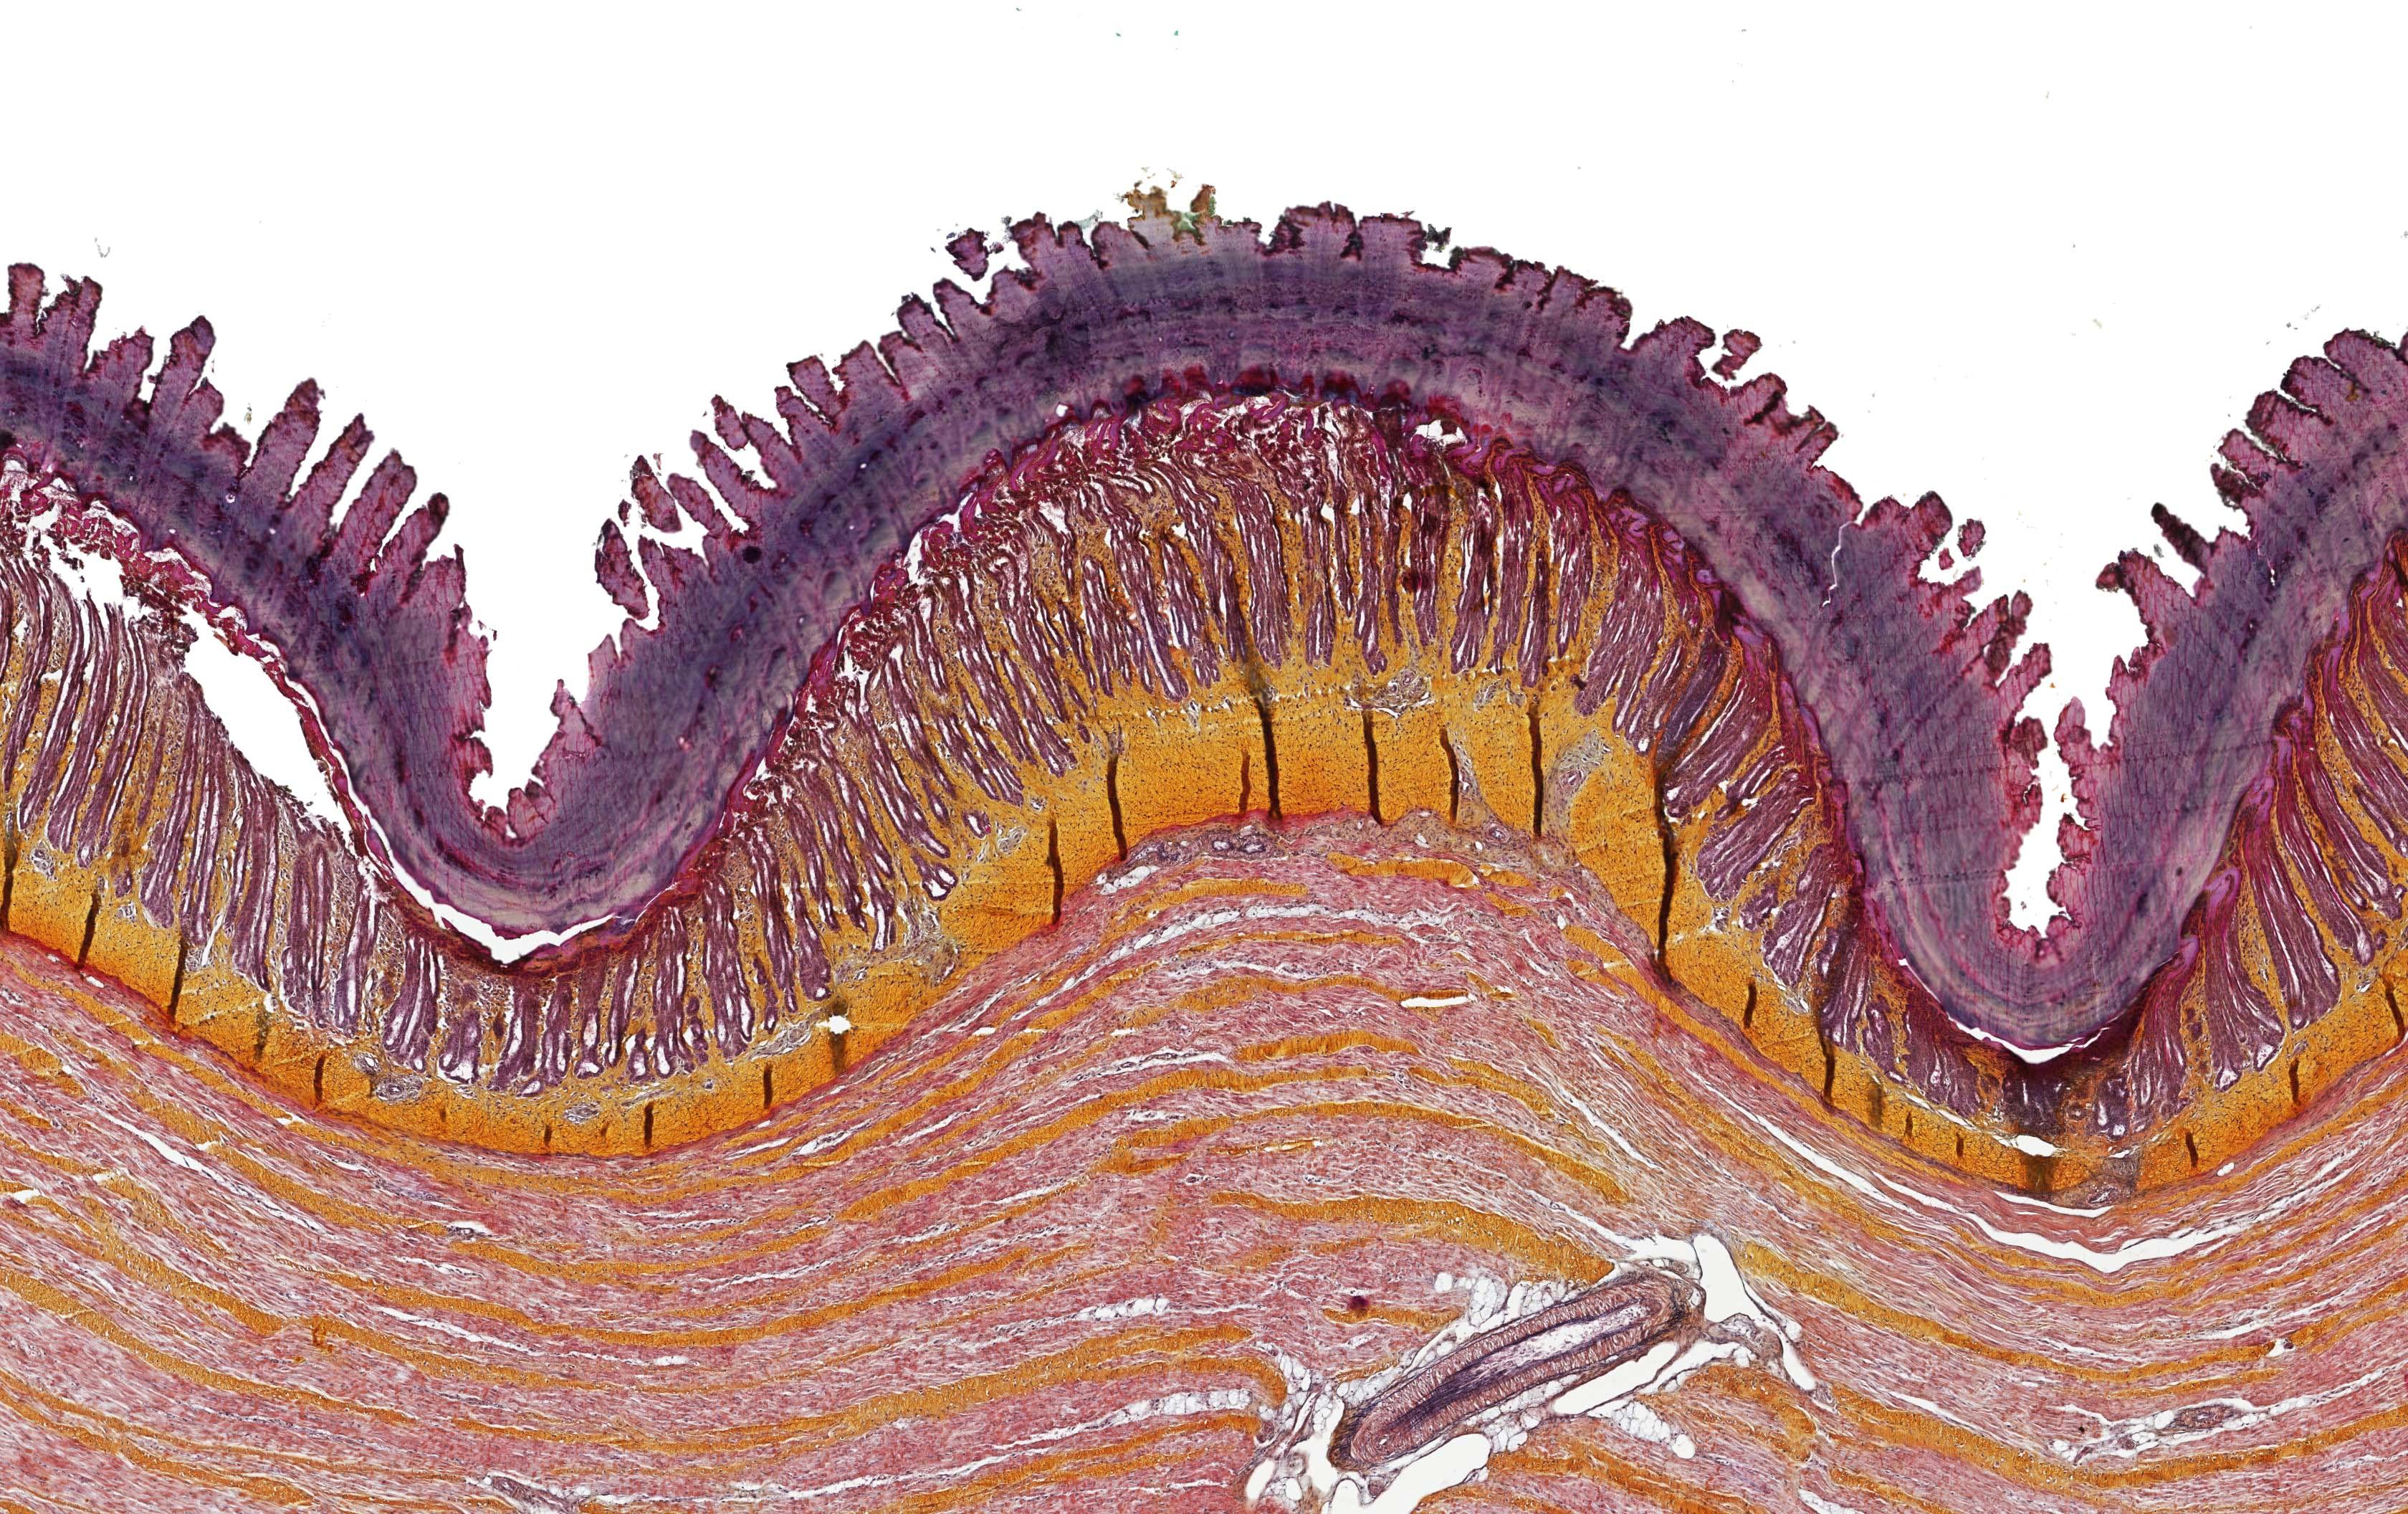 ALTHISIA movat pentachrome 10